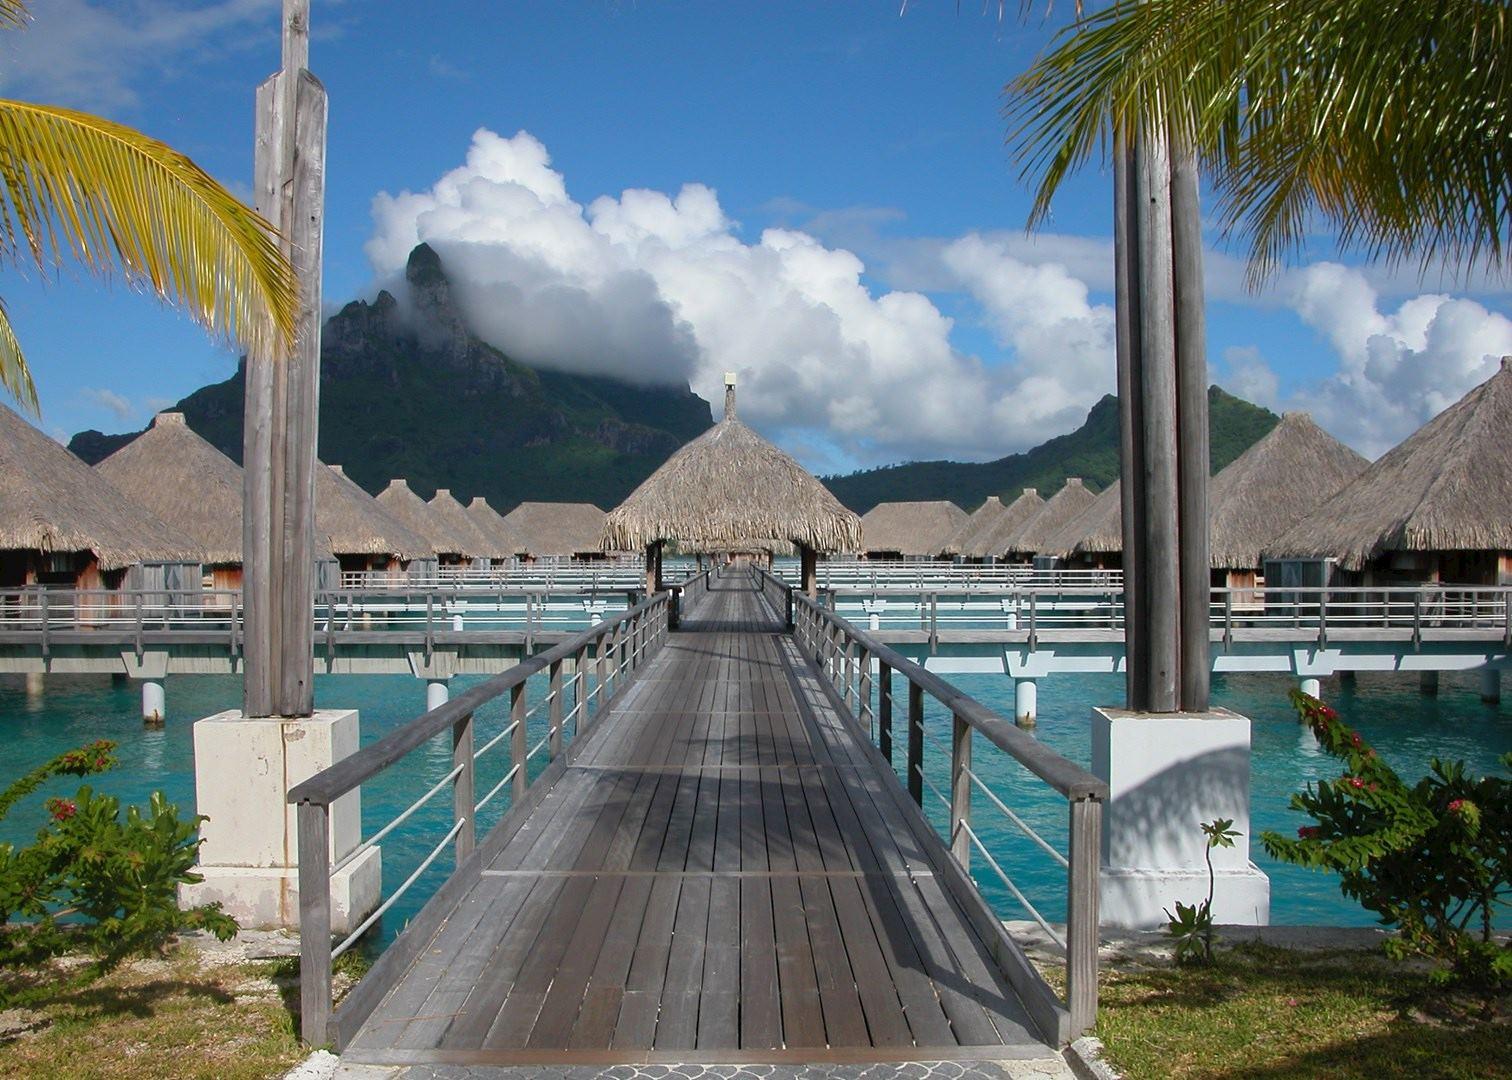 St Regis Resort Hotels In Bora Bora Audley Travel